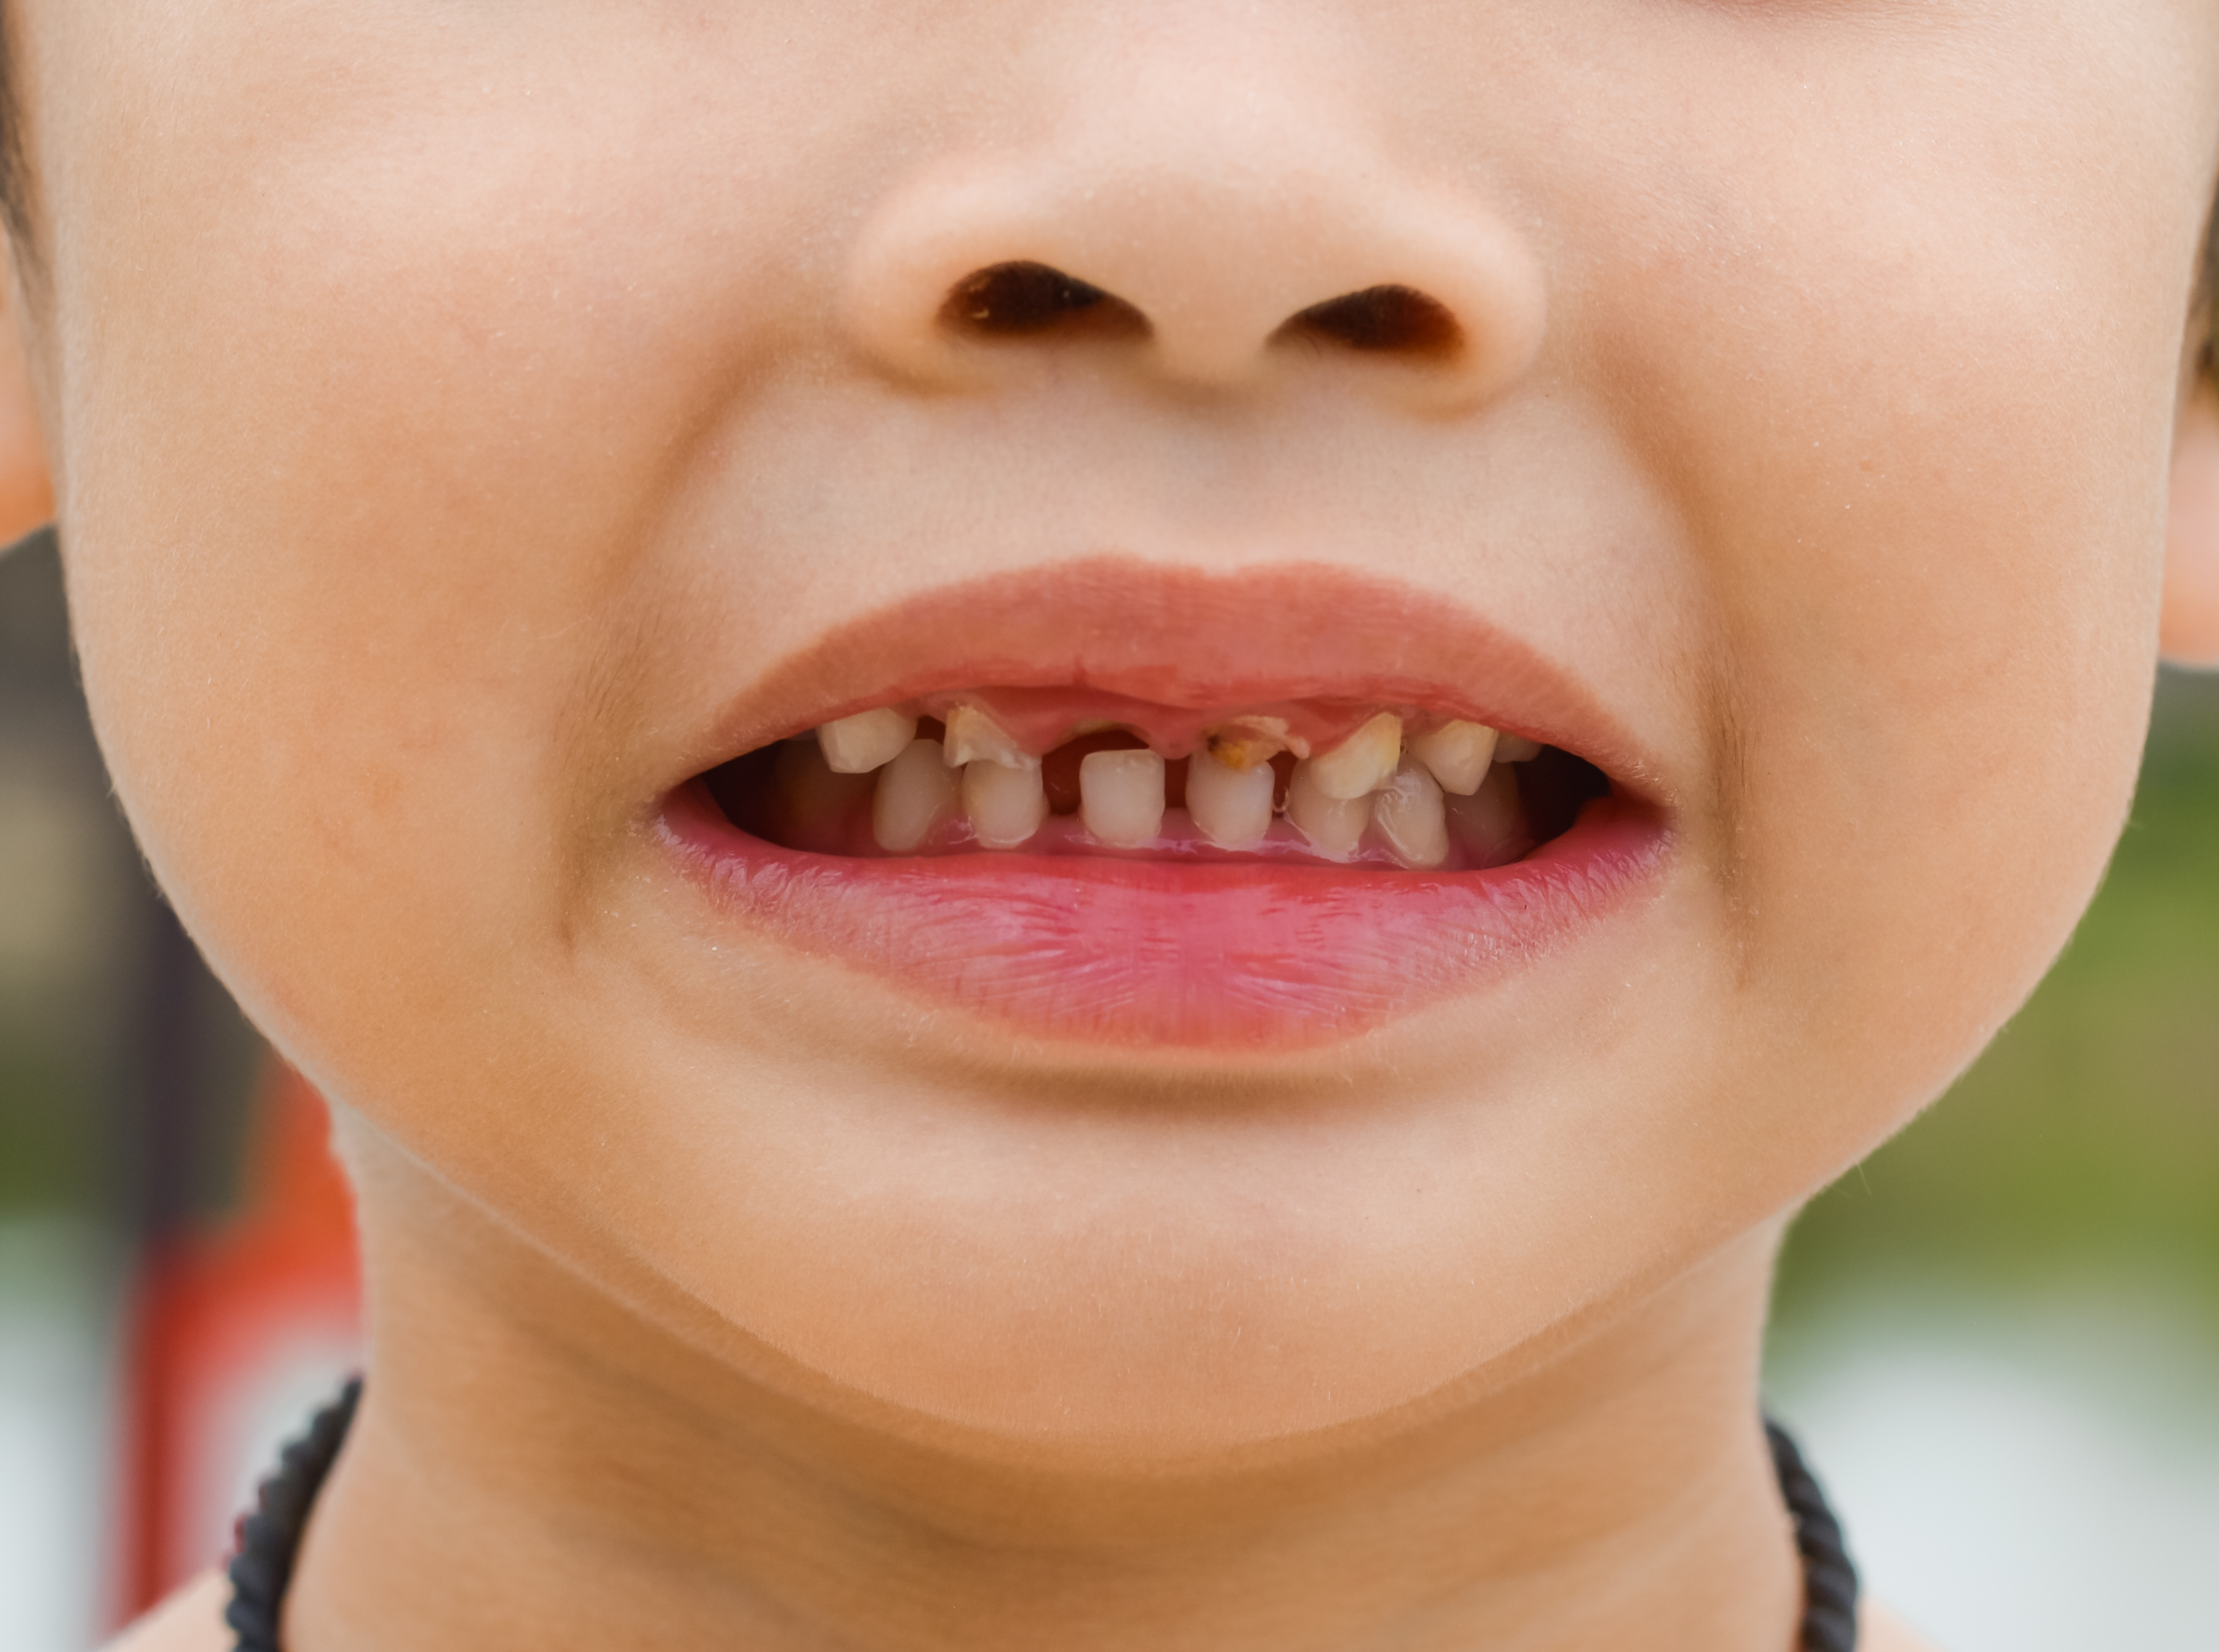 Caries y Fracturas Dentales